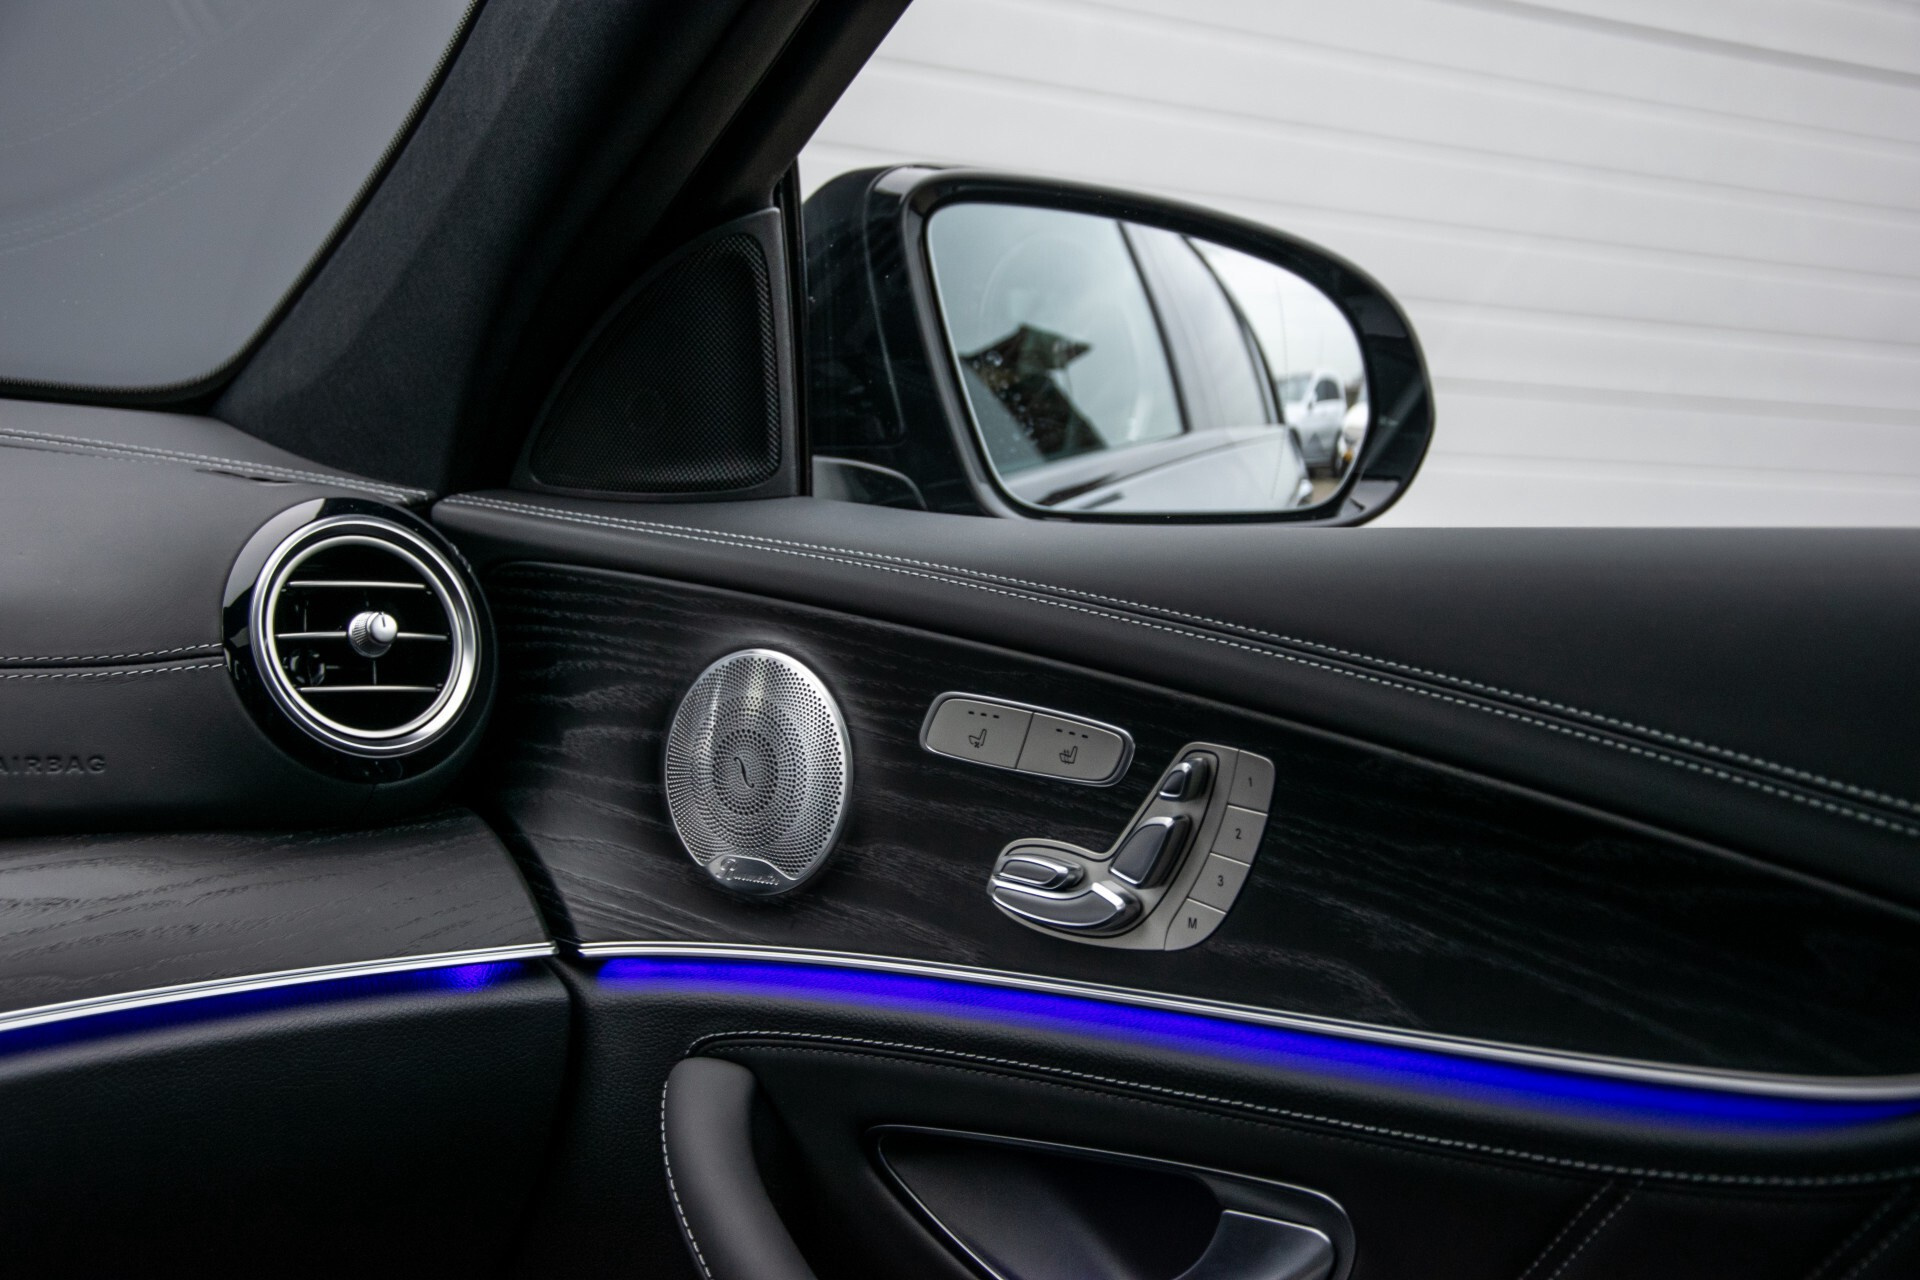 Mercedes-Benz E-Klasse 63 S AMG 4M+ NIEUW MODEL Night/Massage/Rij-assist/Keyless/Hud Aut9 Foto 14